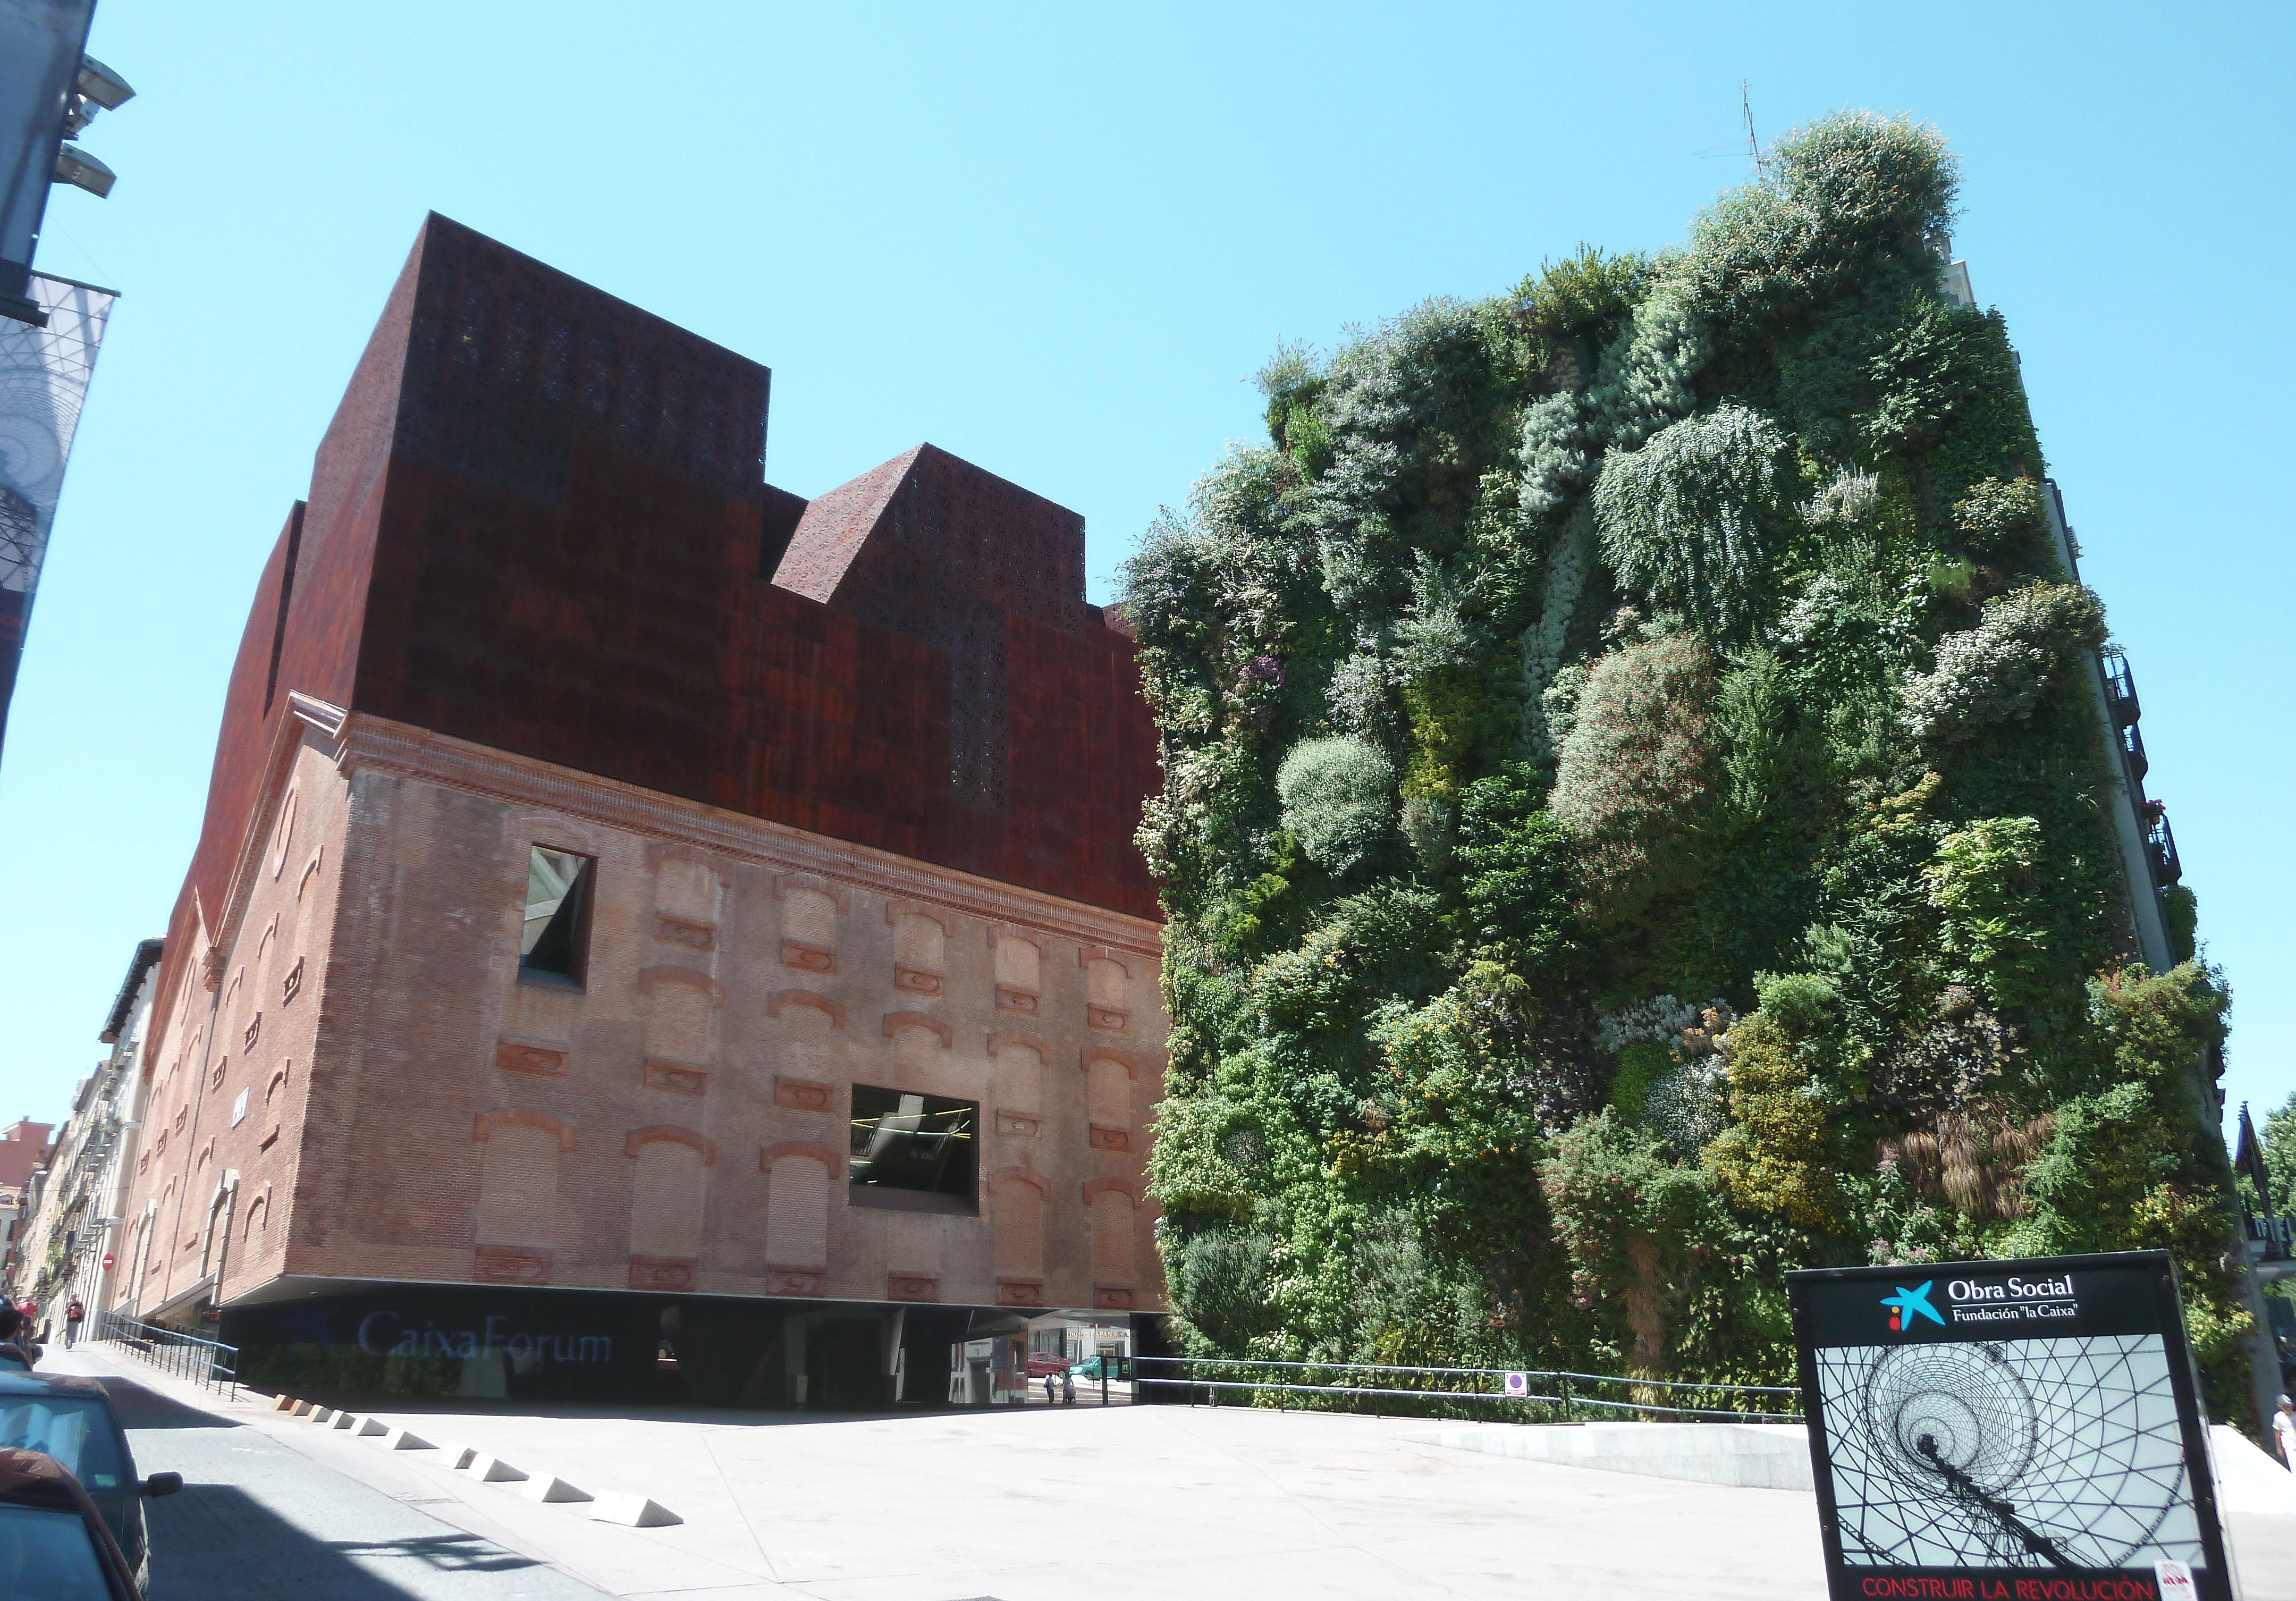 Caixaforum madrid wikiwand for Jardin vertical caixaforum madrid